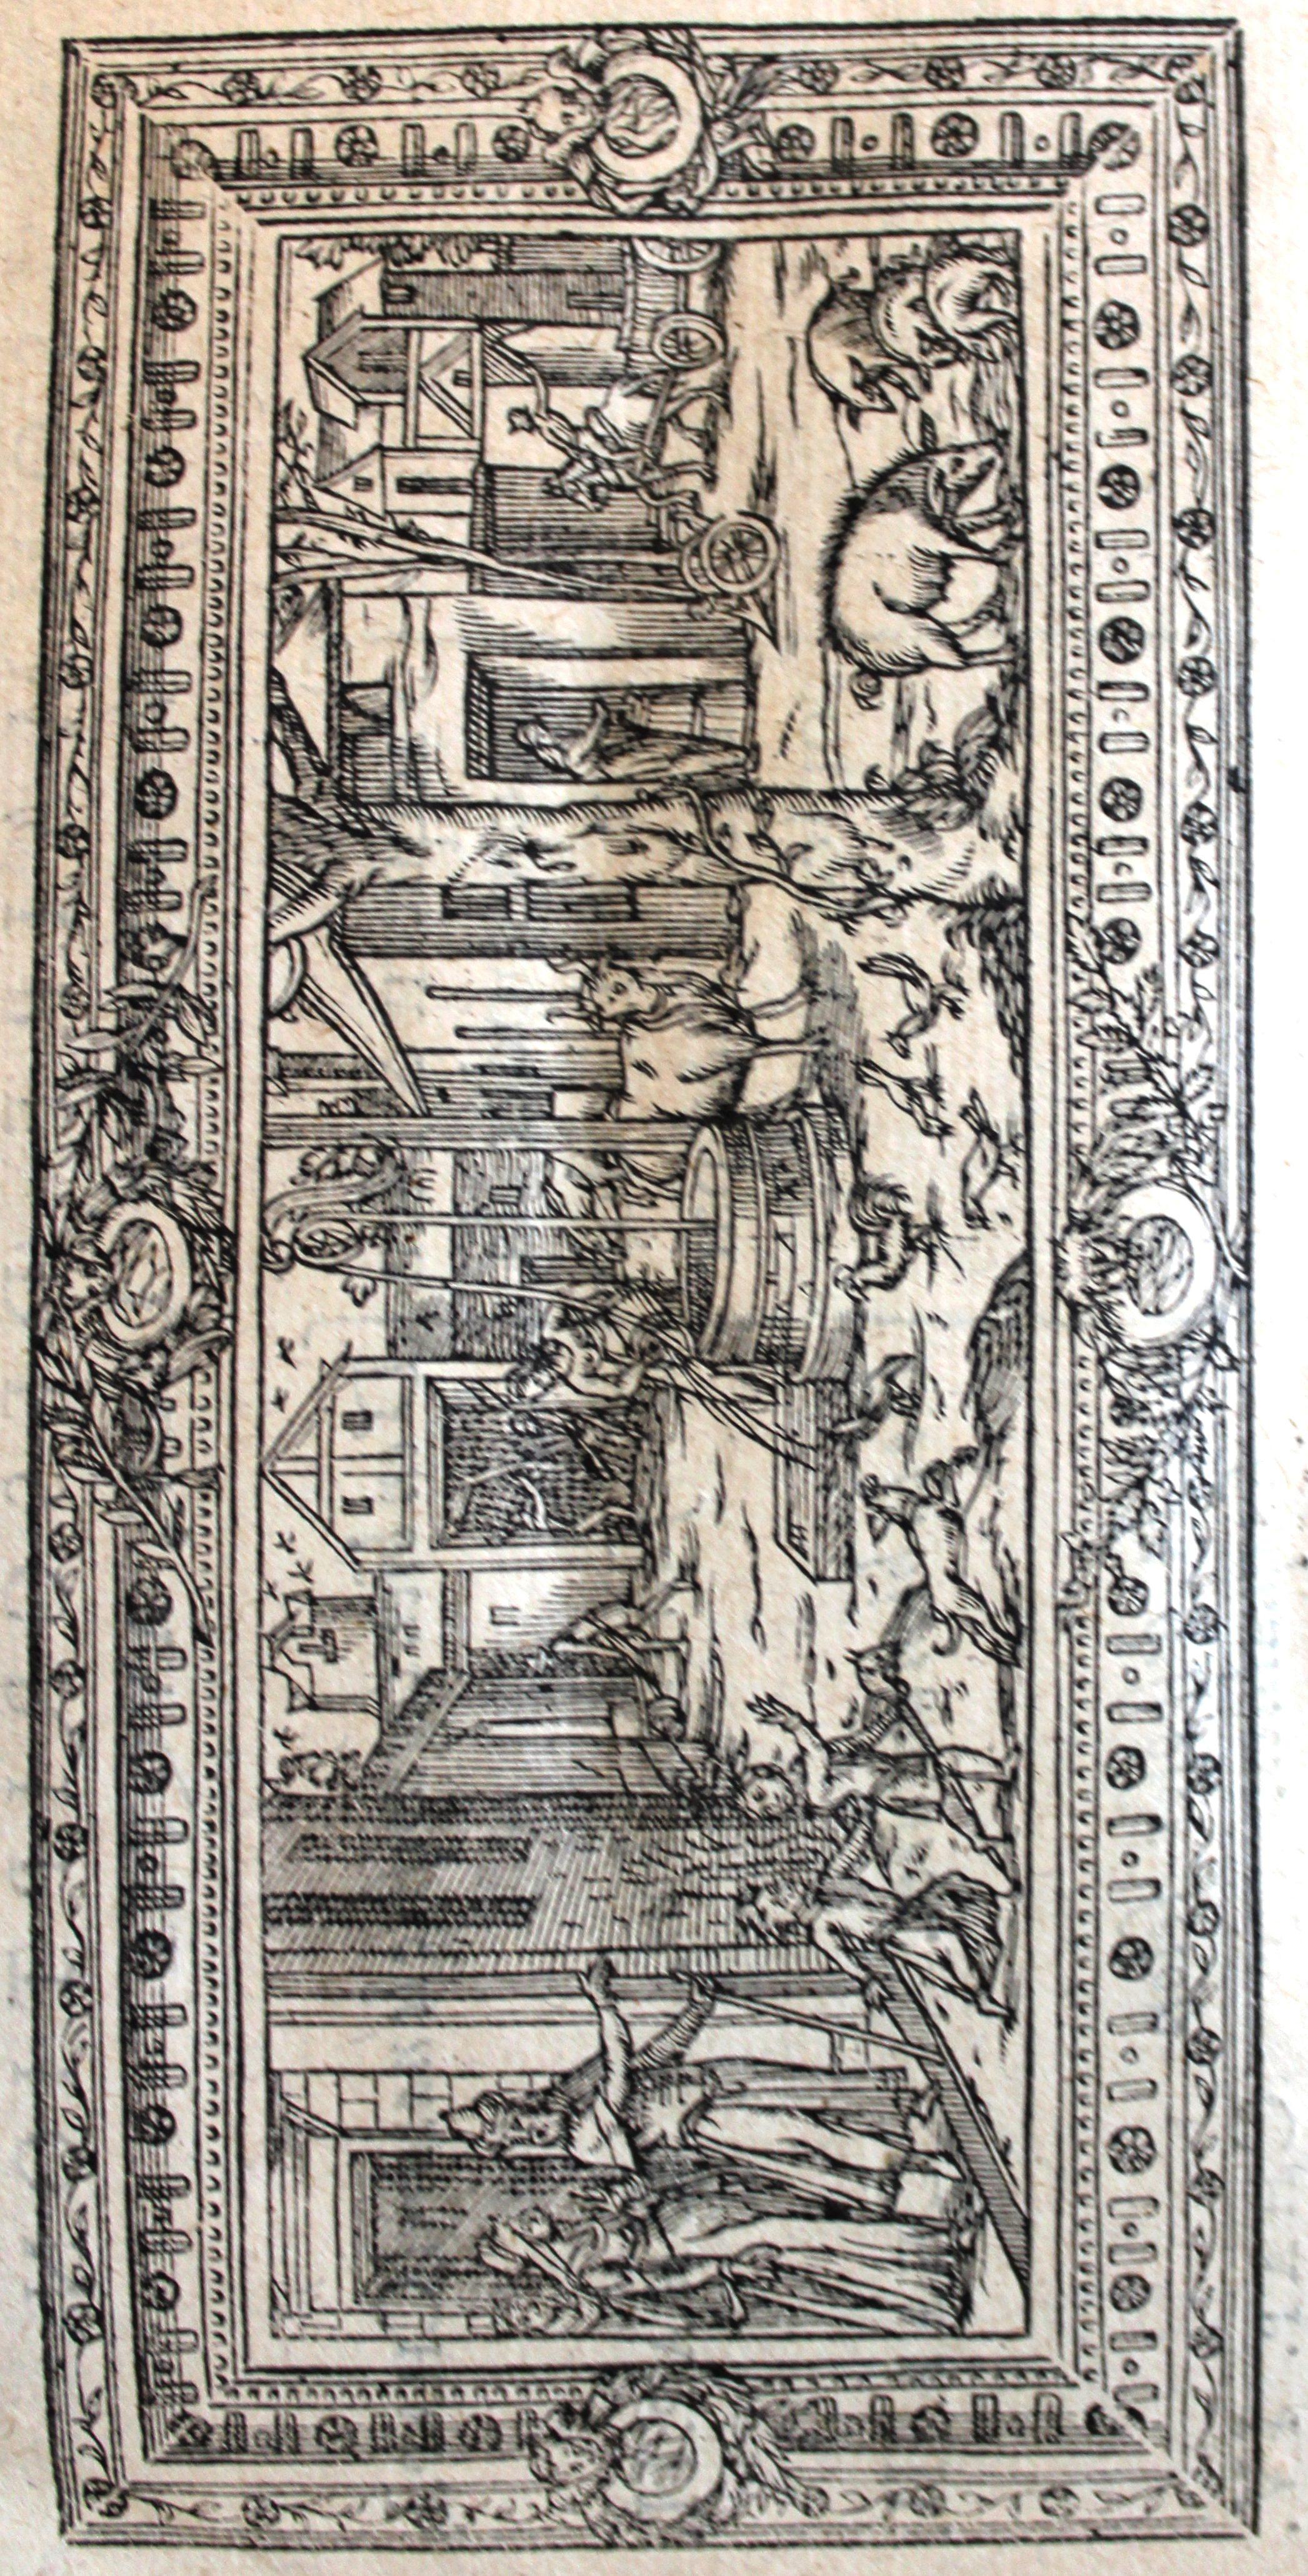 Illustration Chapitre 1 1600